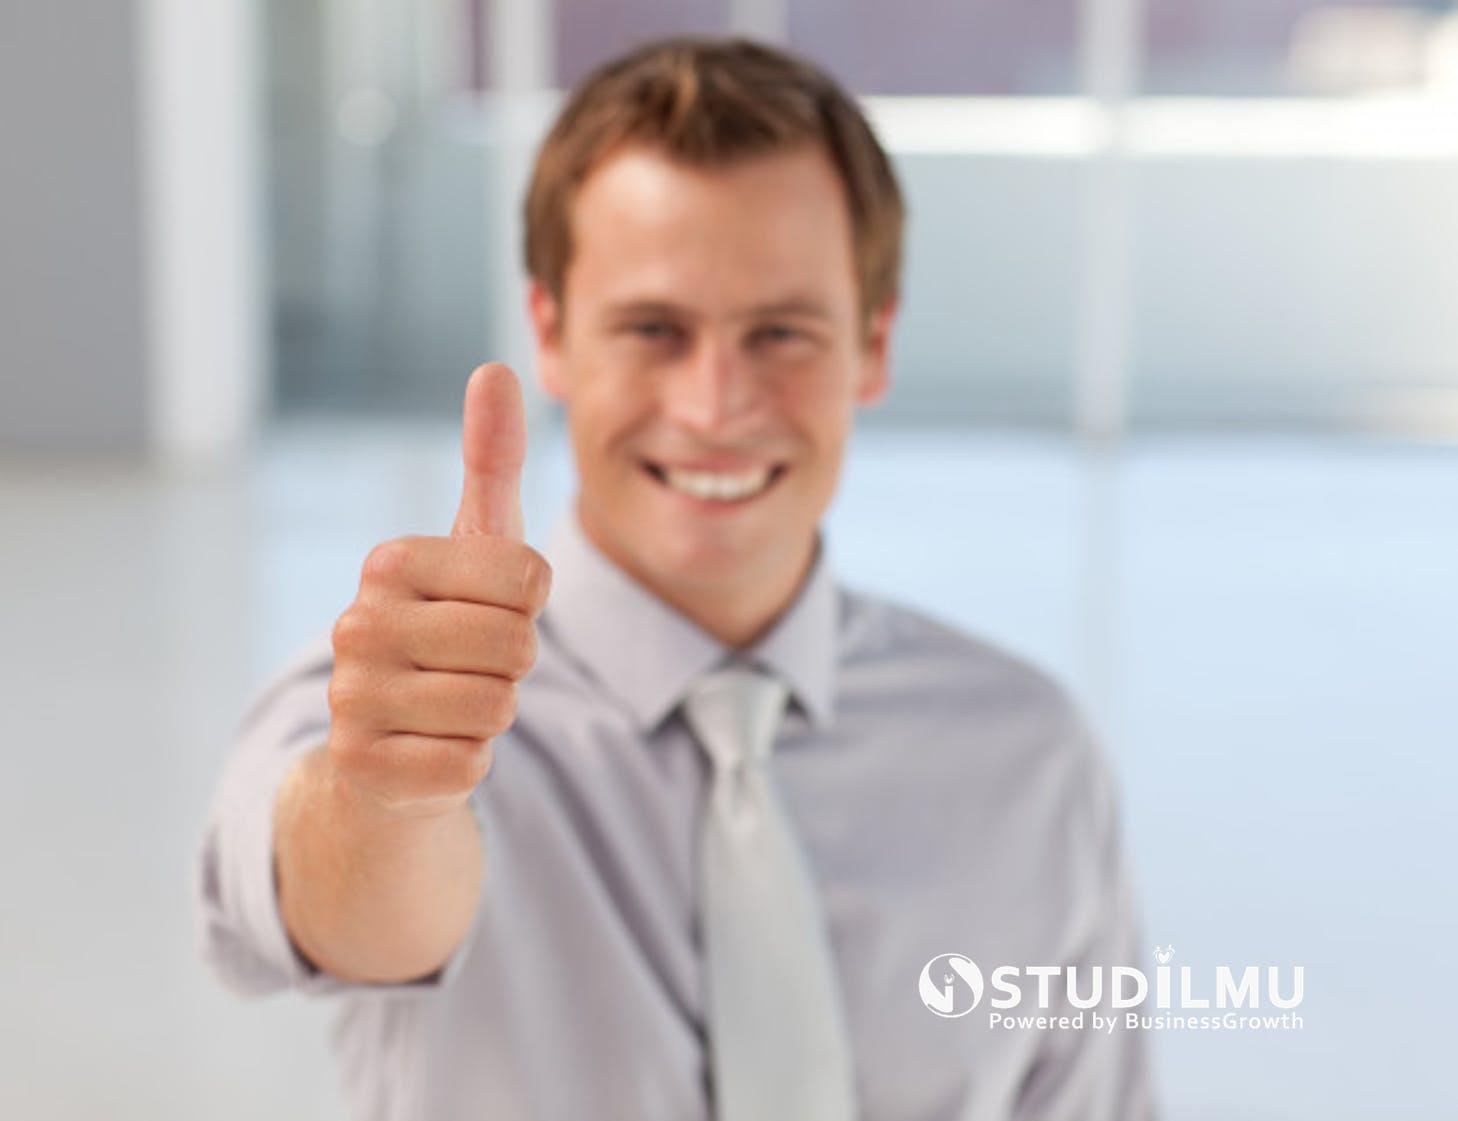 STUDILMU Career Advice - Percaya Diri Dimulai dari Diri Sendiri